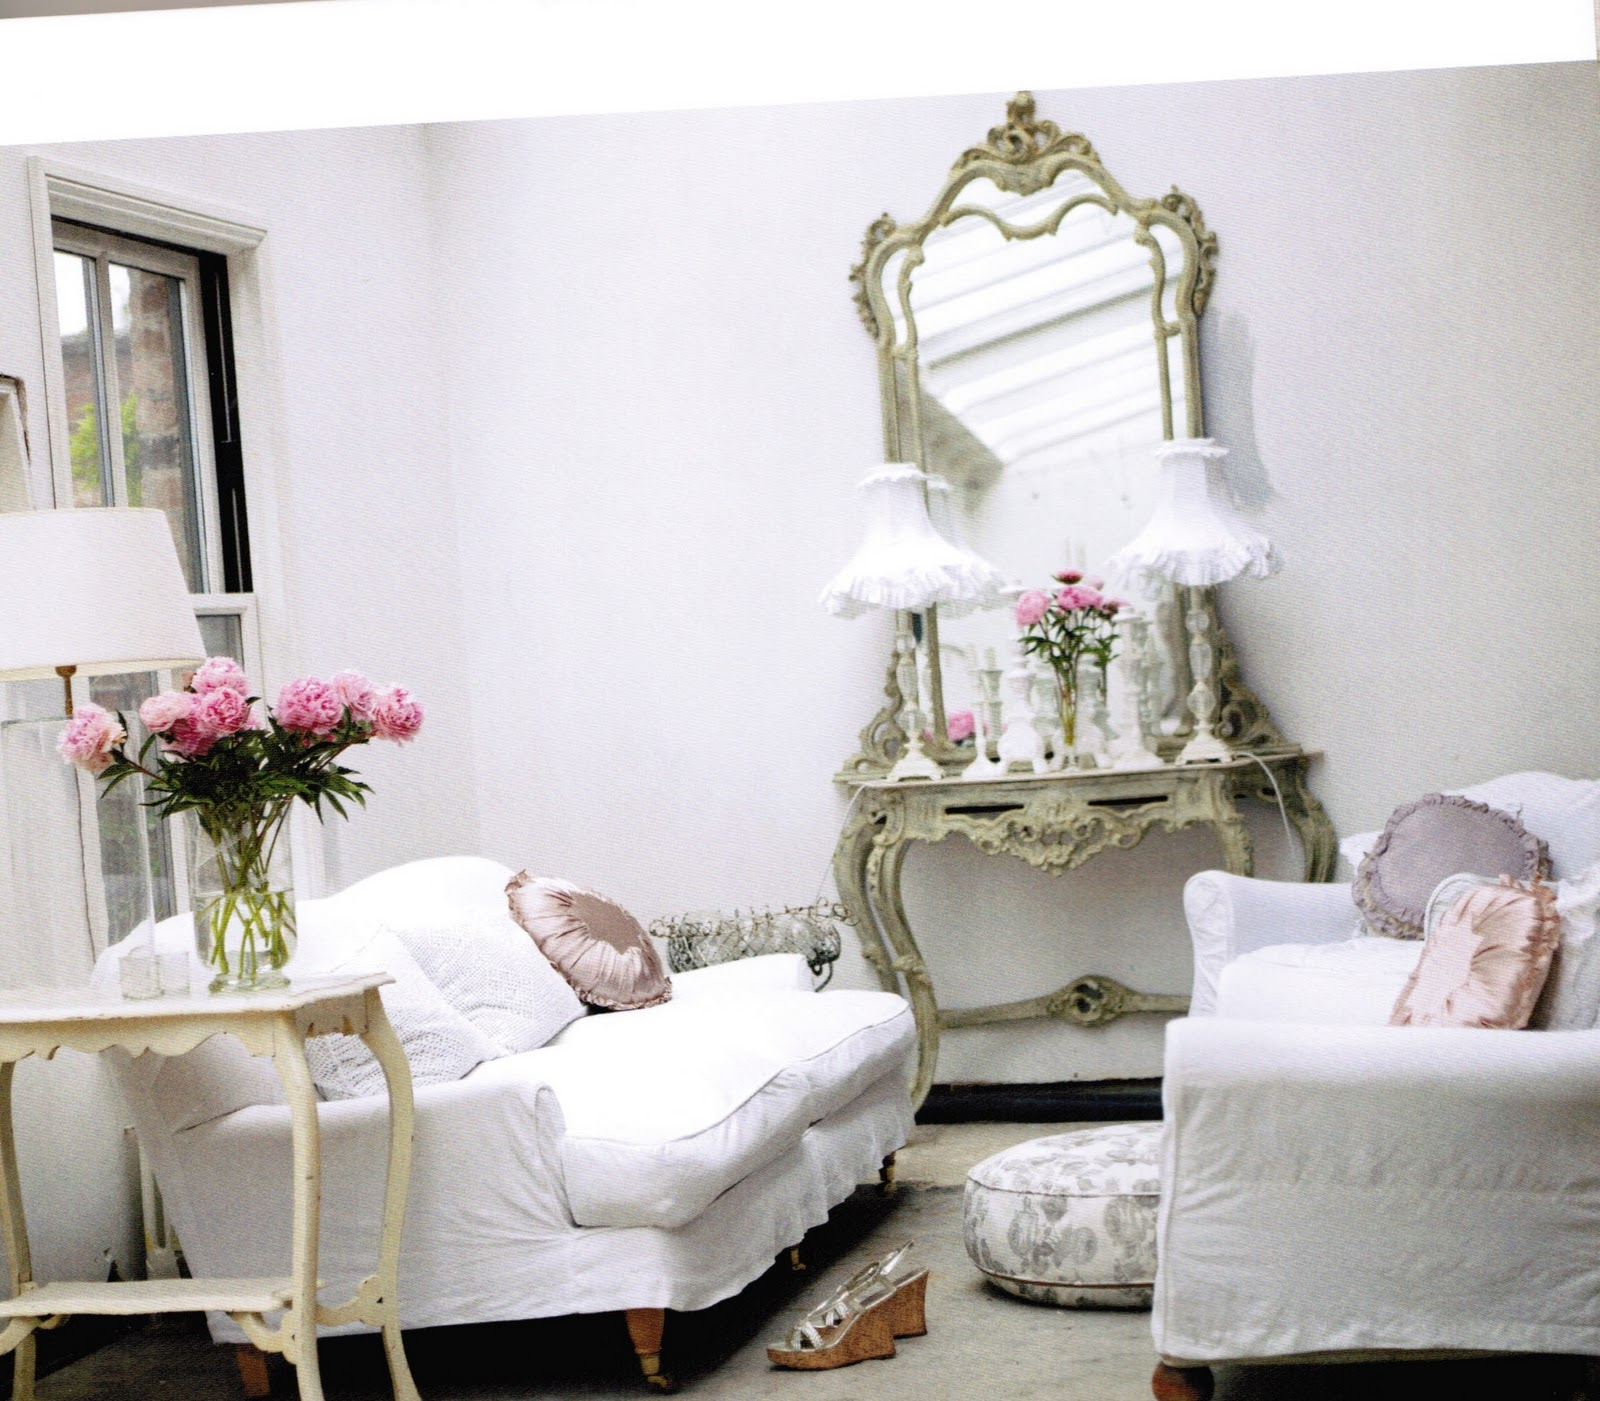 maison decor romantic style book giveaway. Black Bedroom Furniture Sets. Home Design Ideas